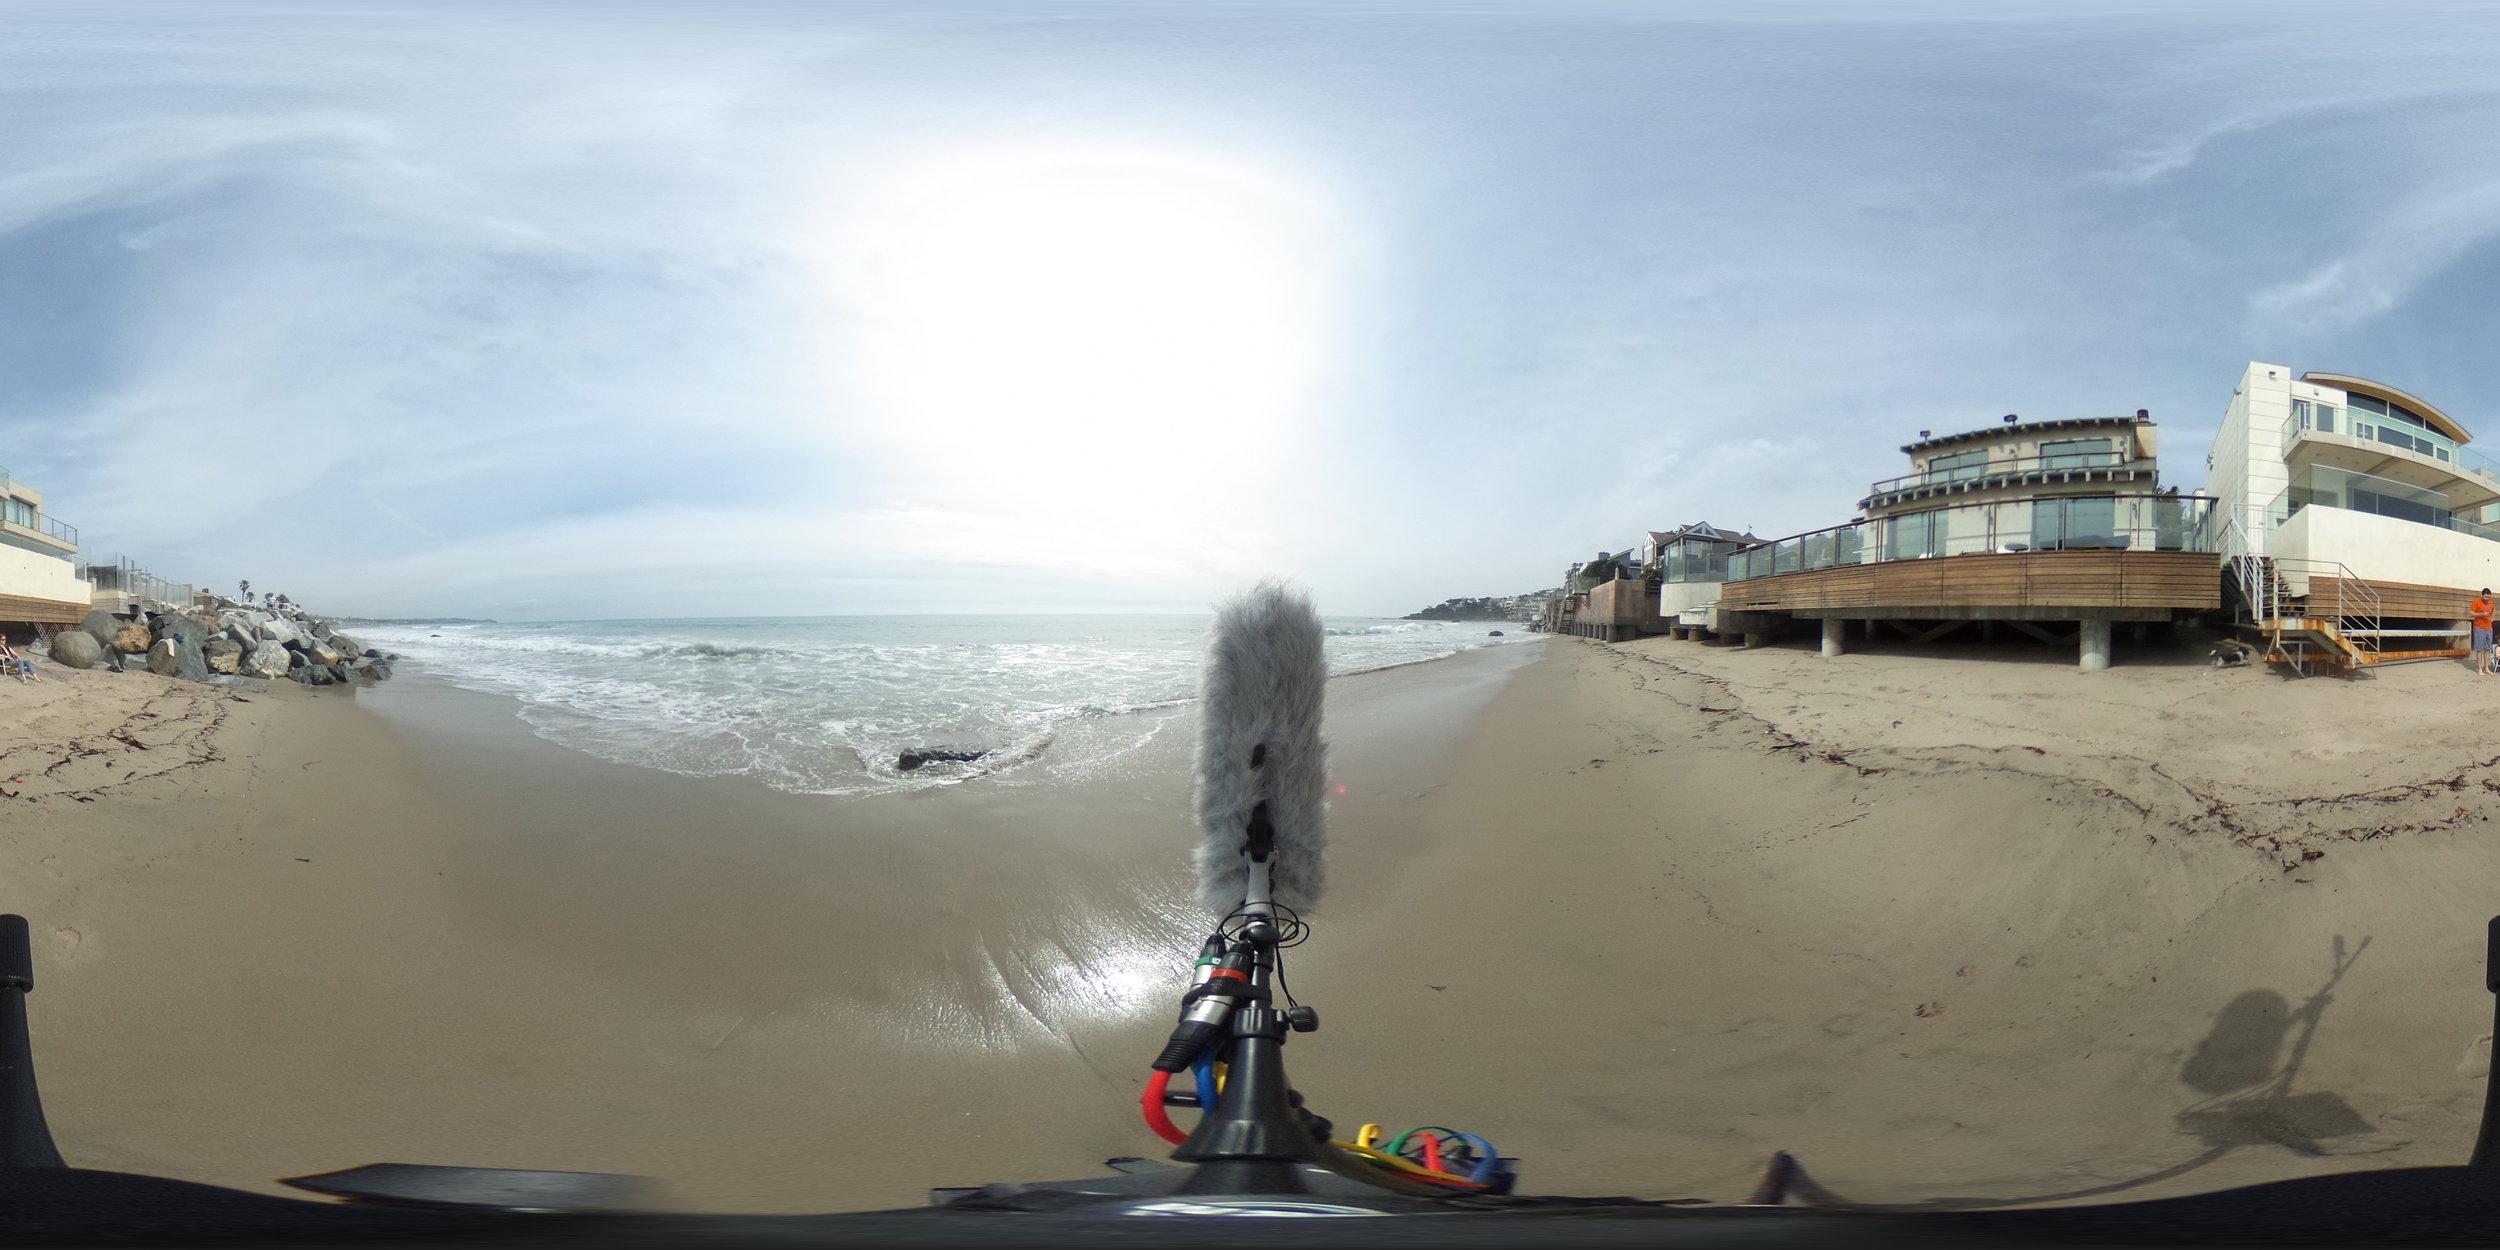 EXT_Day_Beach_SteadyOceanWavesOnRocks_WaterLapping_Close_NoPeople_JPEG.JPG